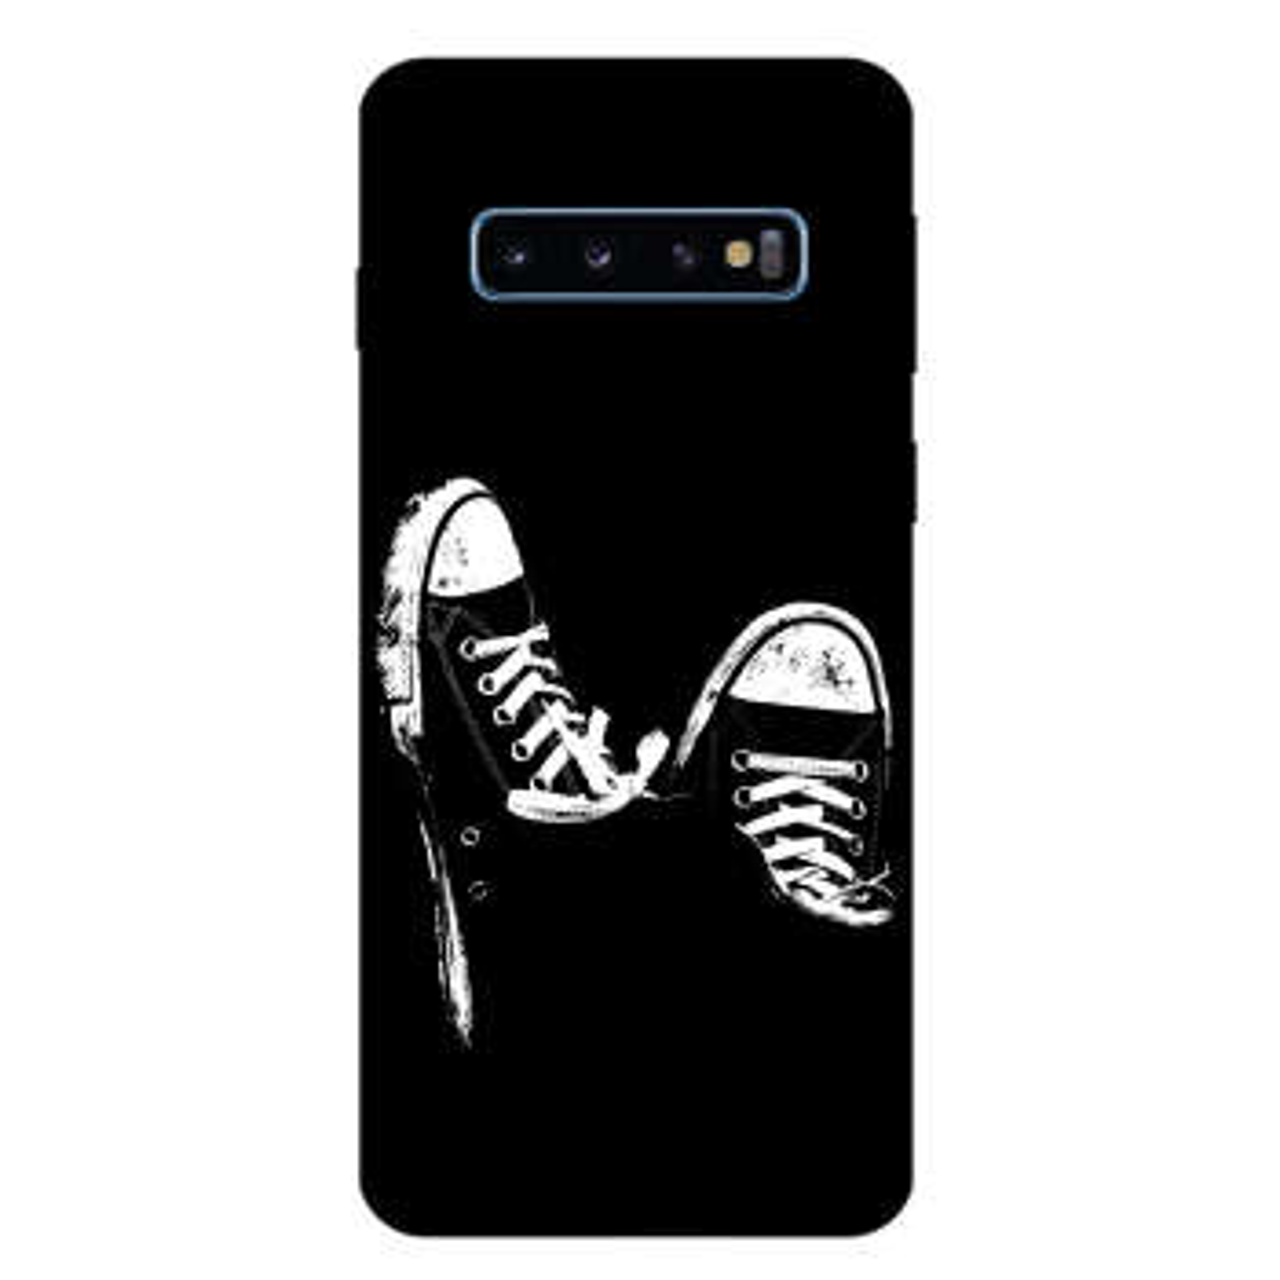 کاور کی اچ کد 0043 مناسب برای گوشی موبایل سامسونگ  Galaxy S10 PLUS